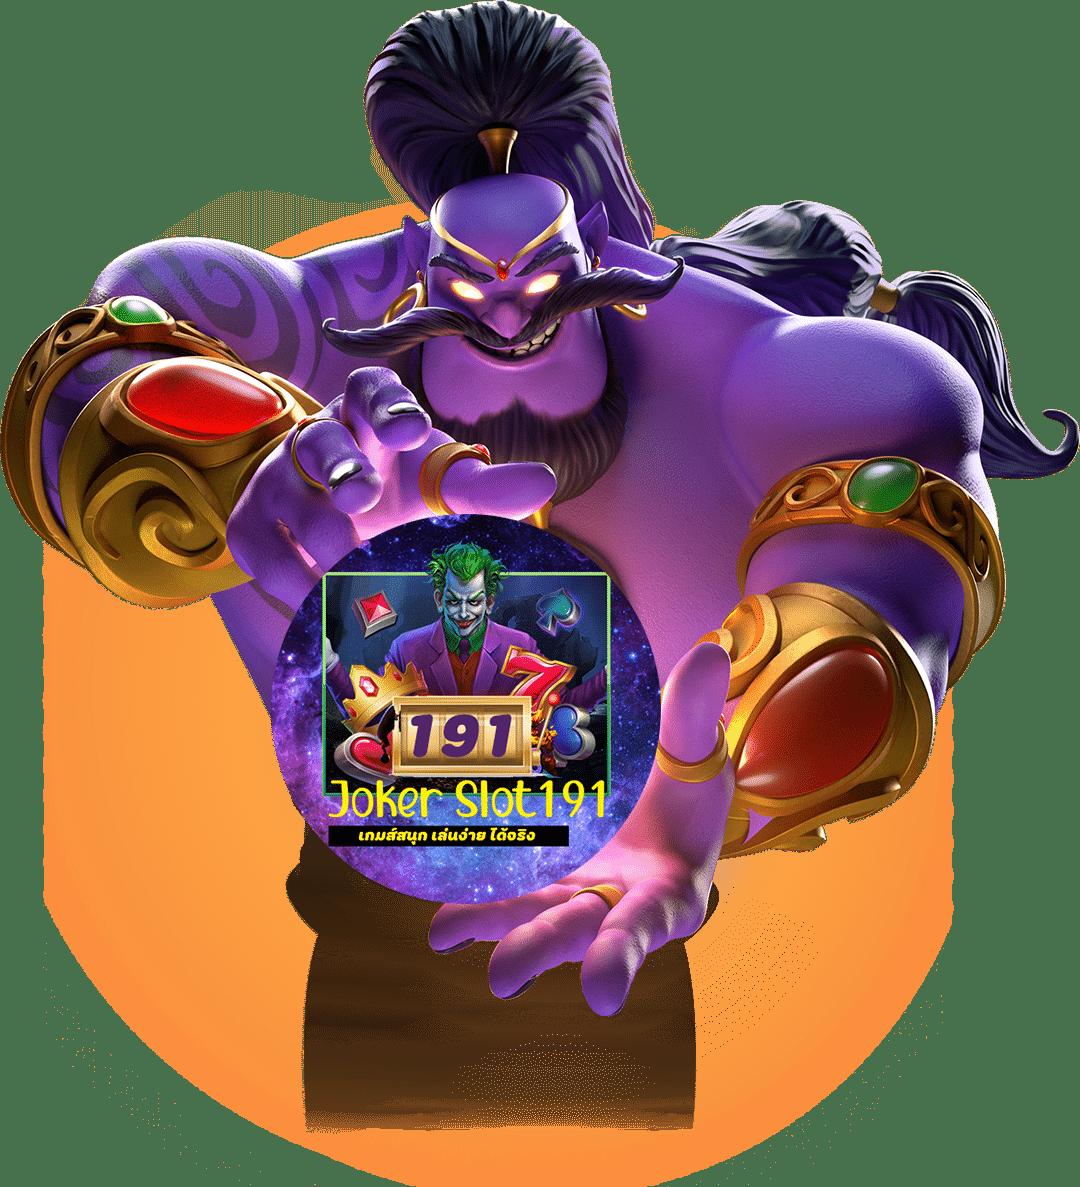 Joker Slot191 จากค่ายเกมส์ Joker Game สมาชิกใหม่ รับไปเลยโบนัส 50%